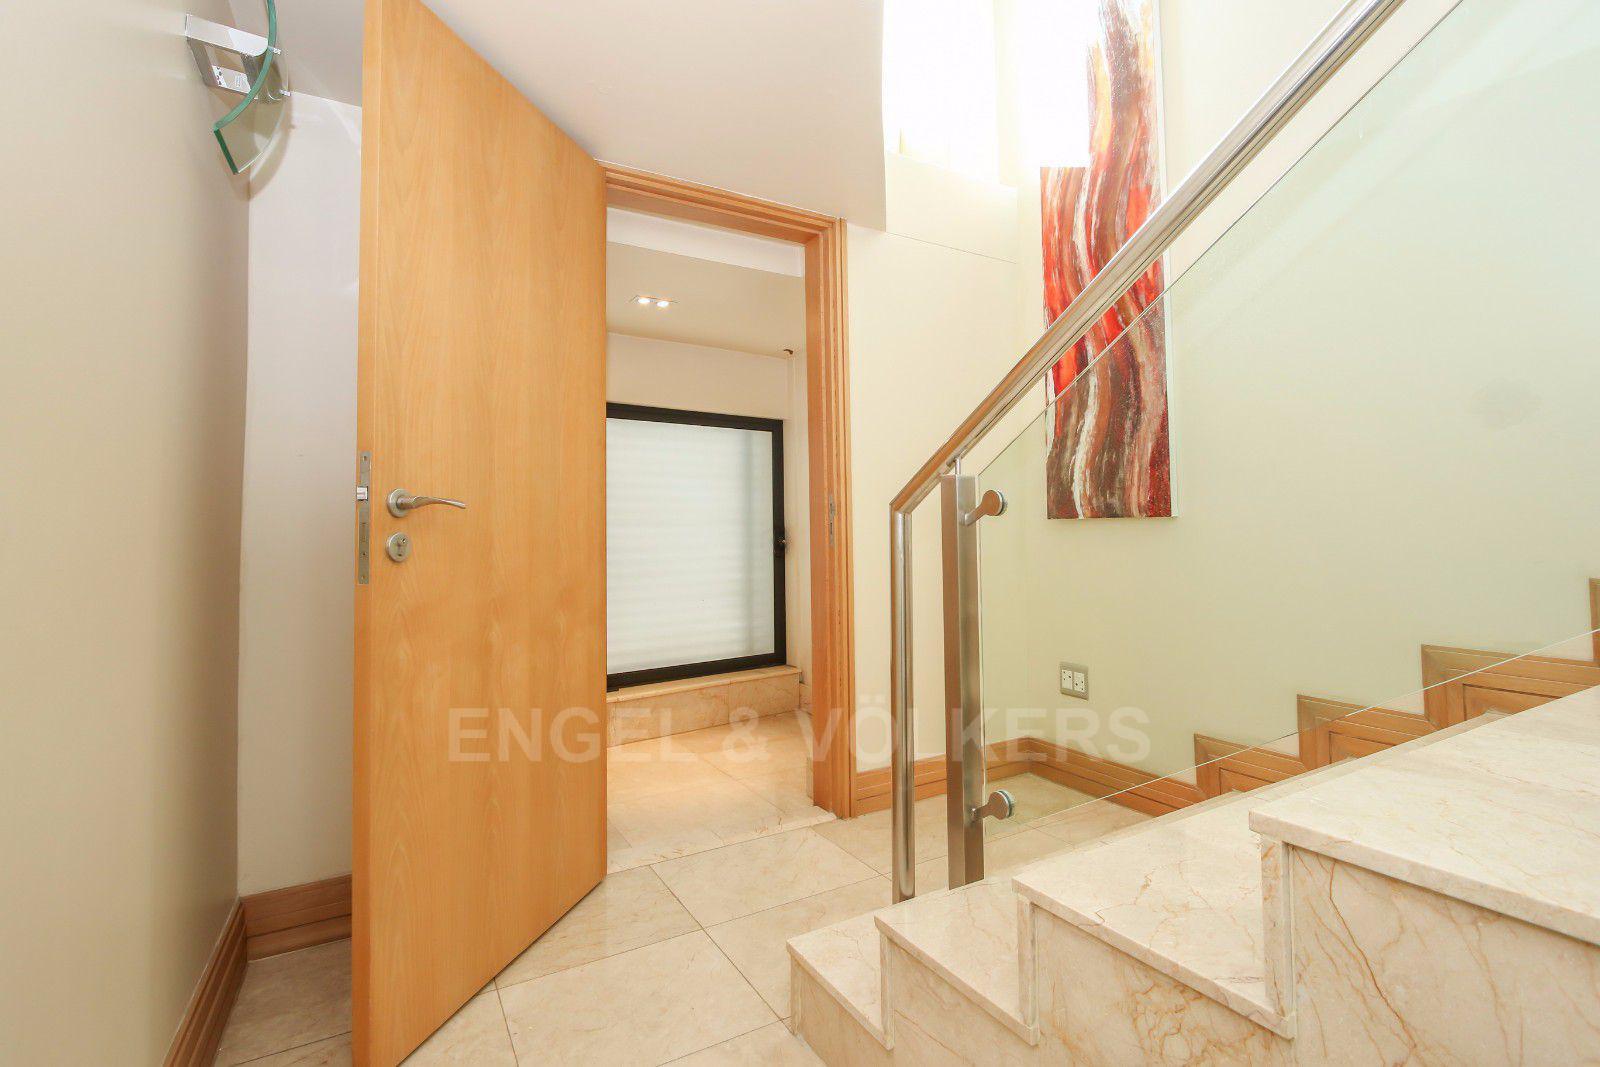 Umhlanga Rocks property for sale. Ref No: 13397187. Picture no 59